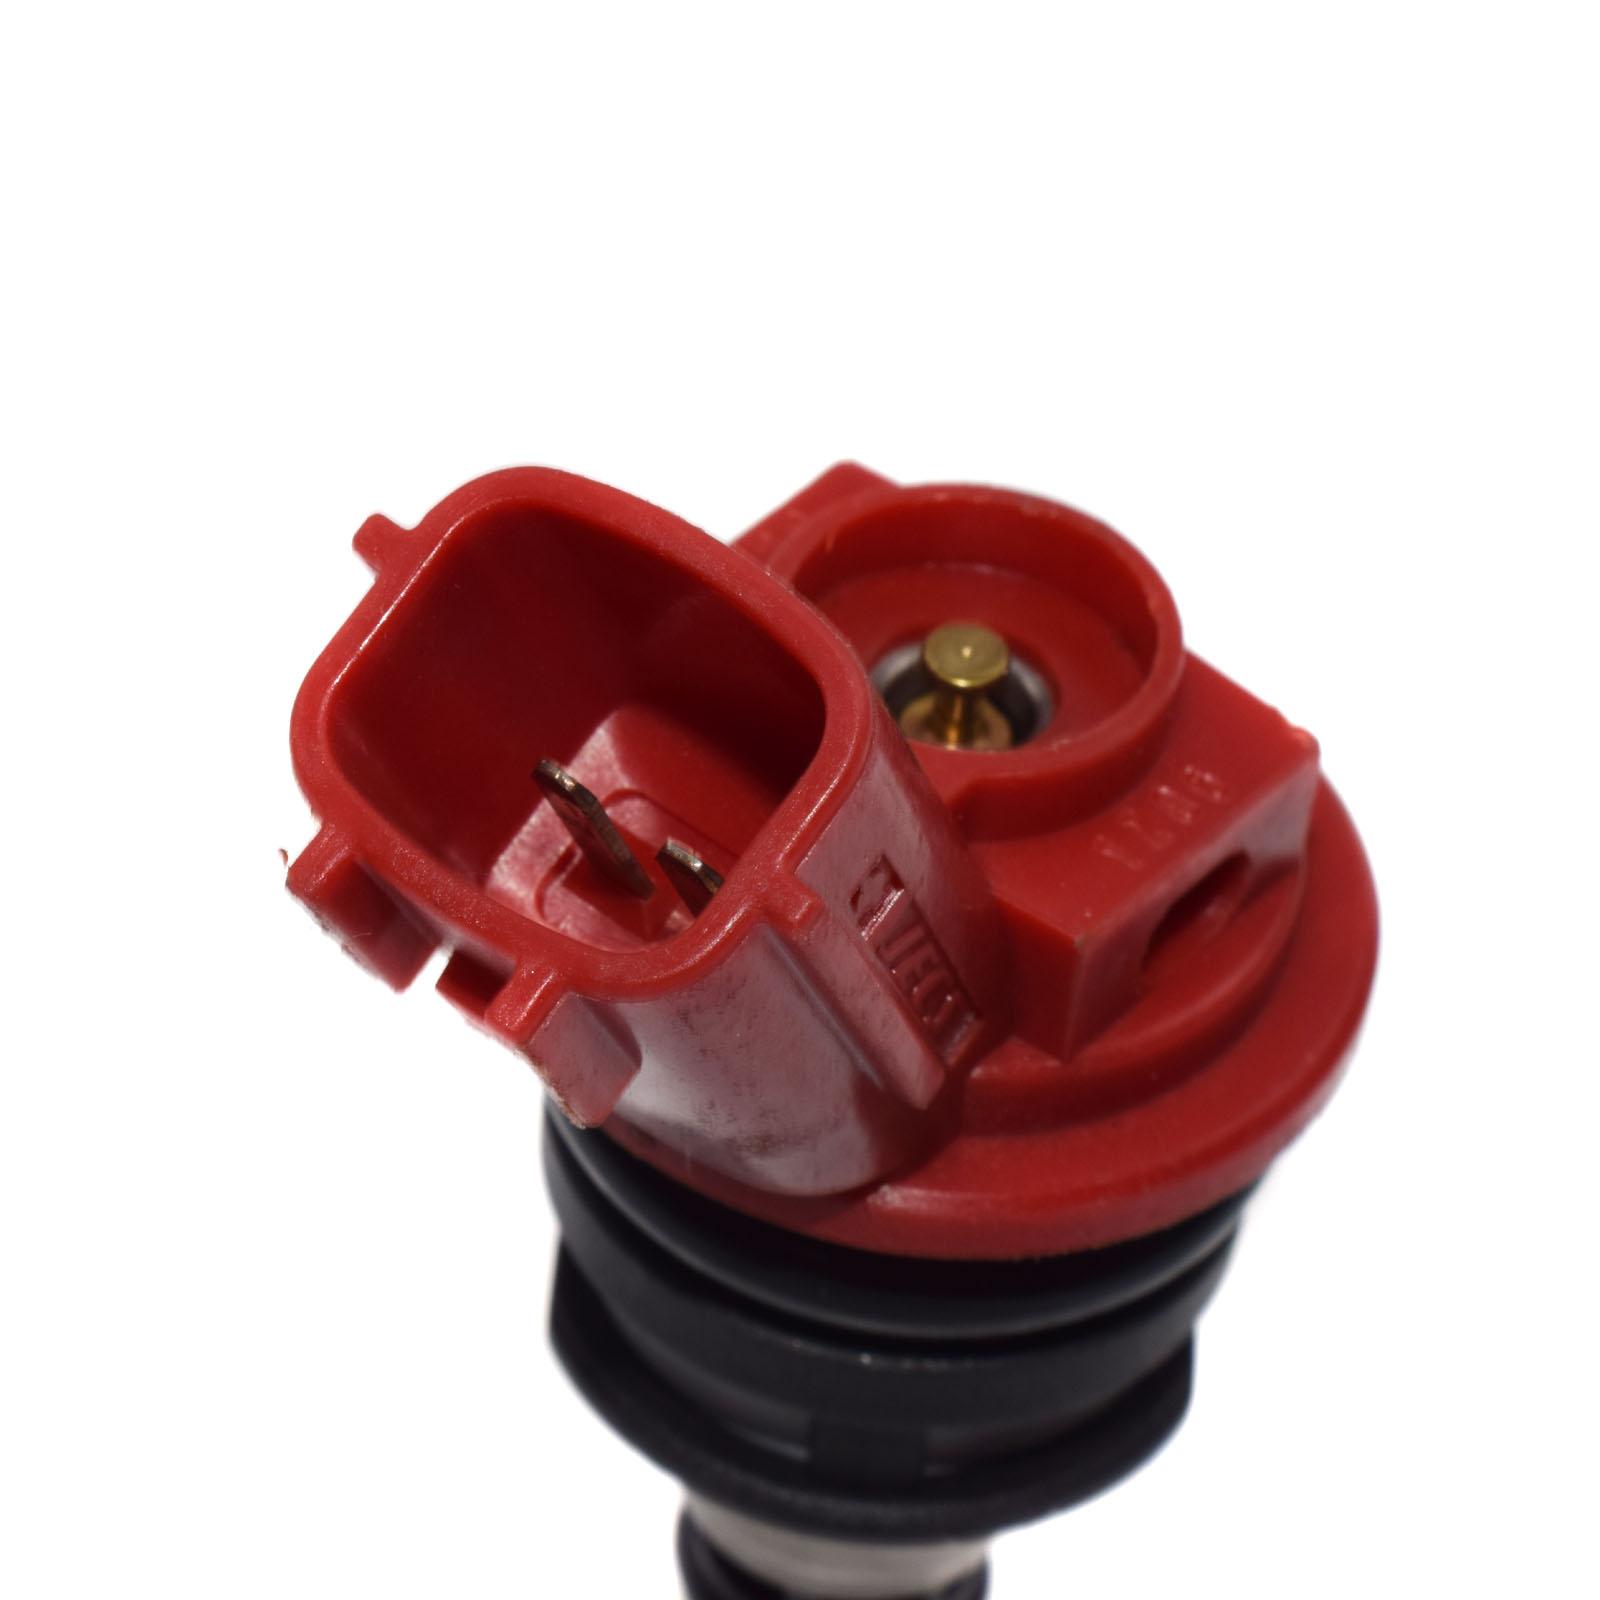 Fuel Injectors For Nissan Infiniti Fuel Injector 842-18114 G20 I30 ...